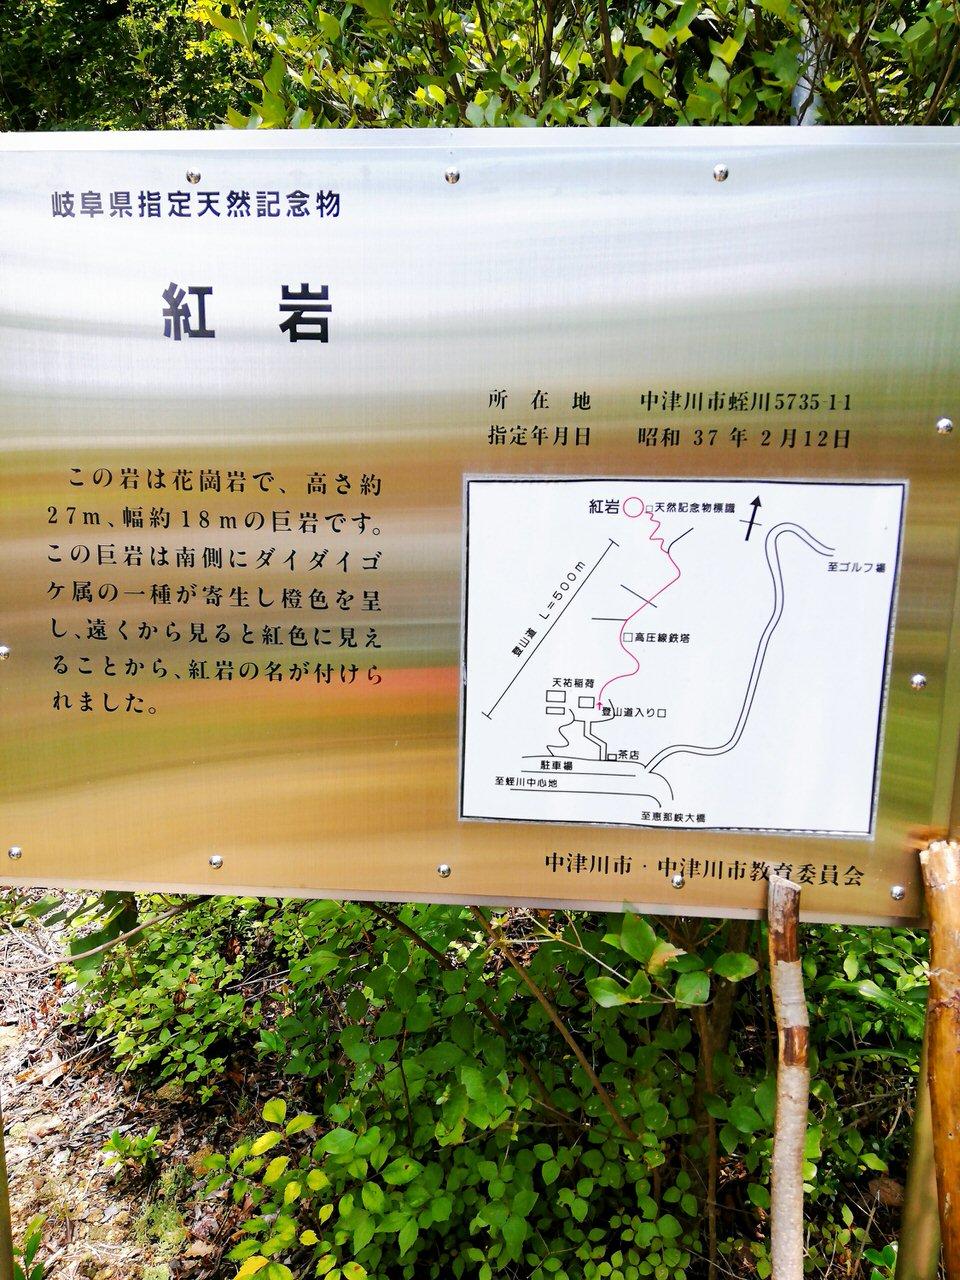 中津川市蛭川の紅岩の看板